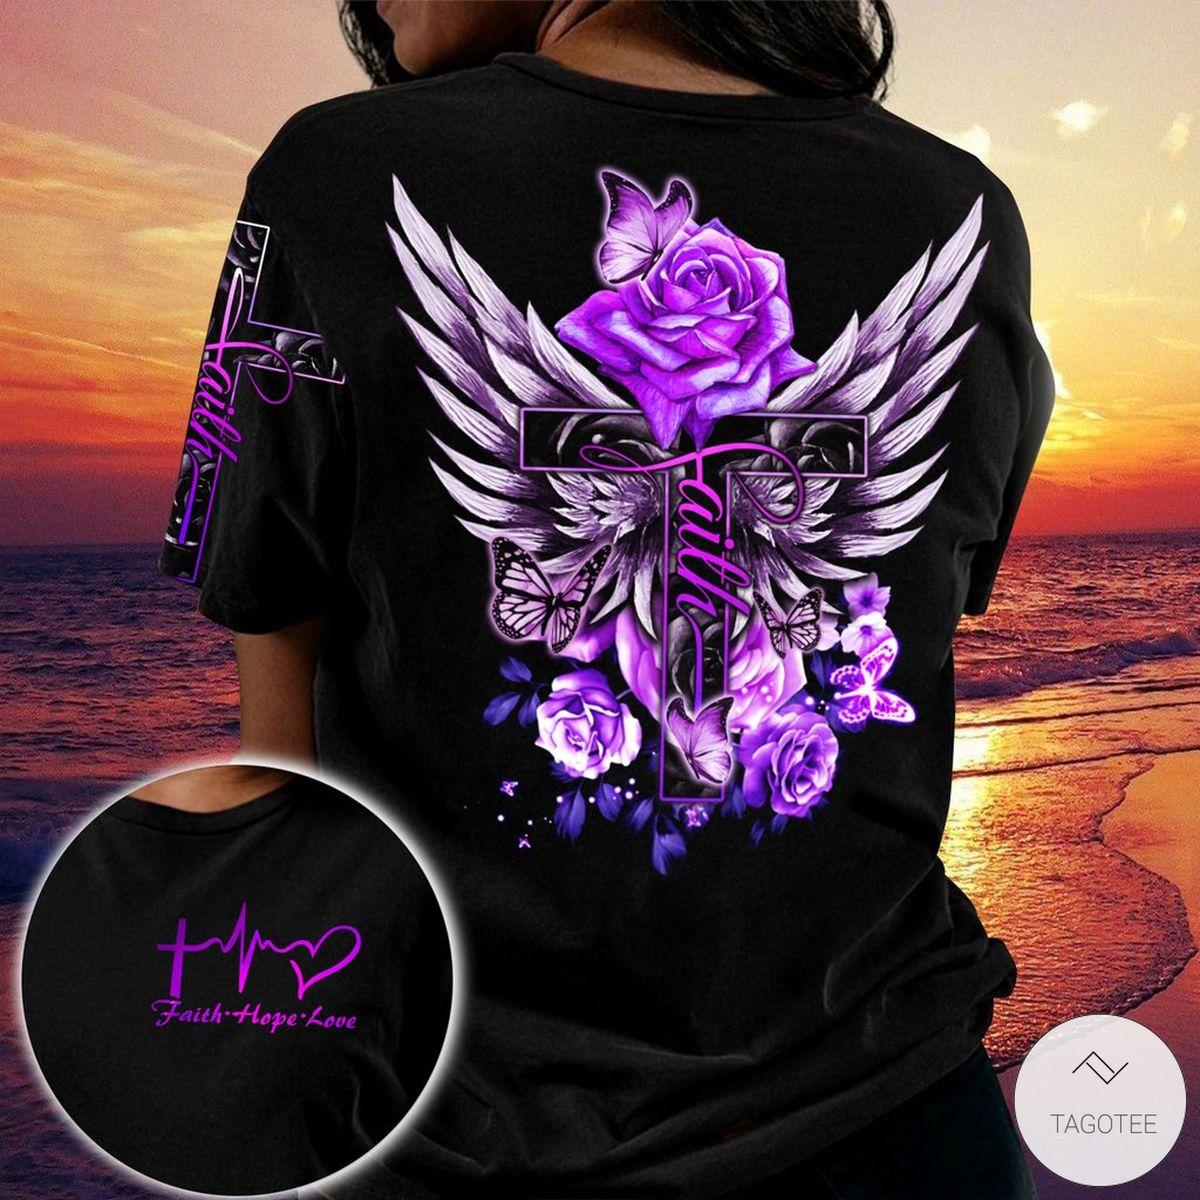 Purple Rose Faith Hope Love Jesus 3D All Over Print T-shirt, Hoodiez